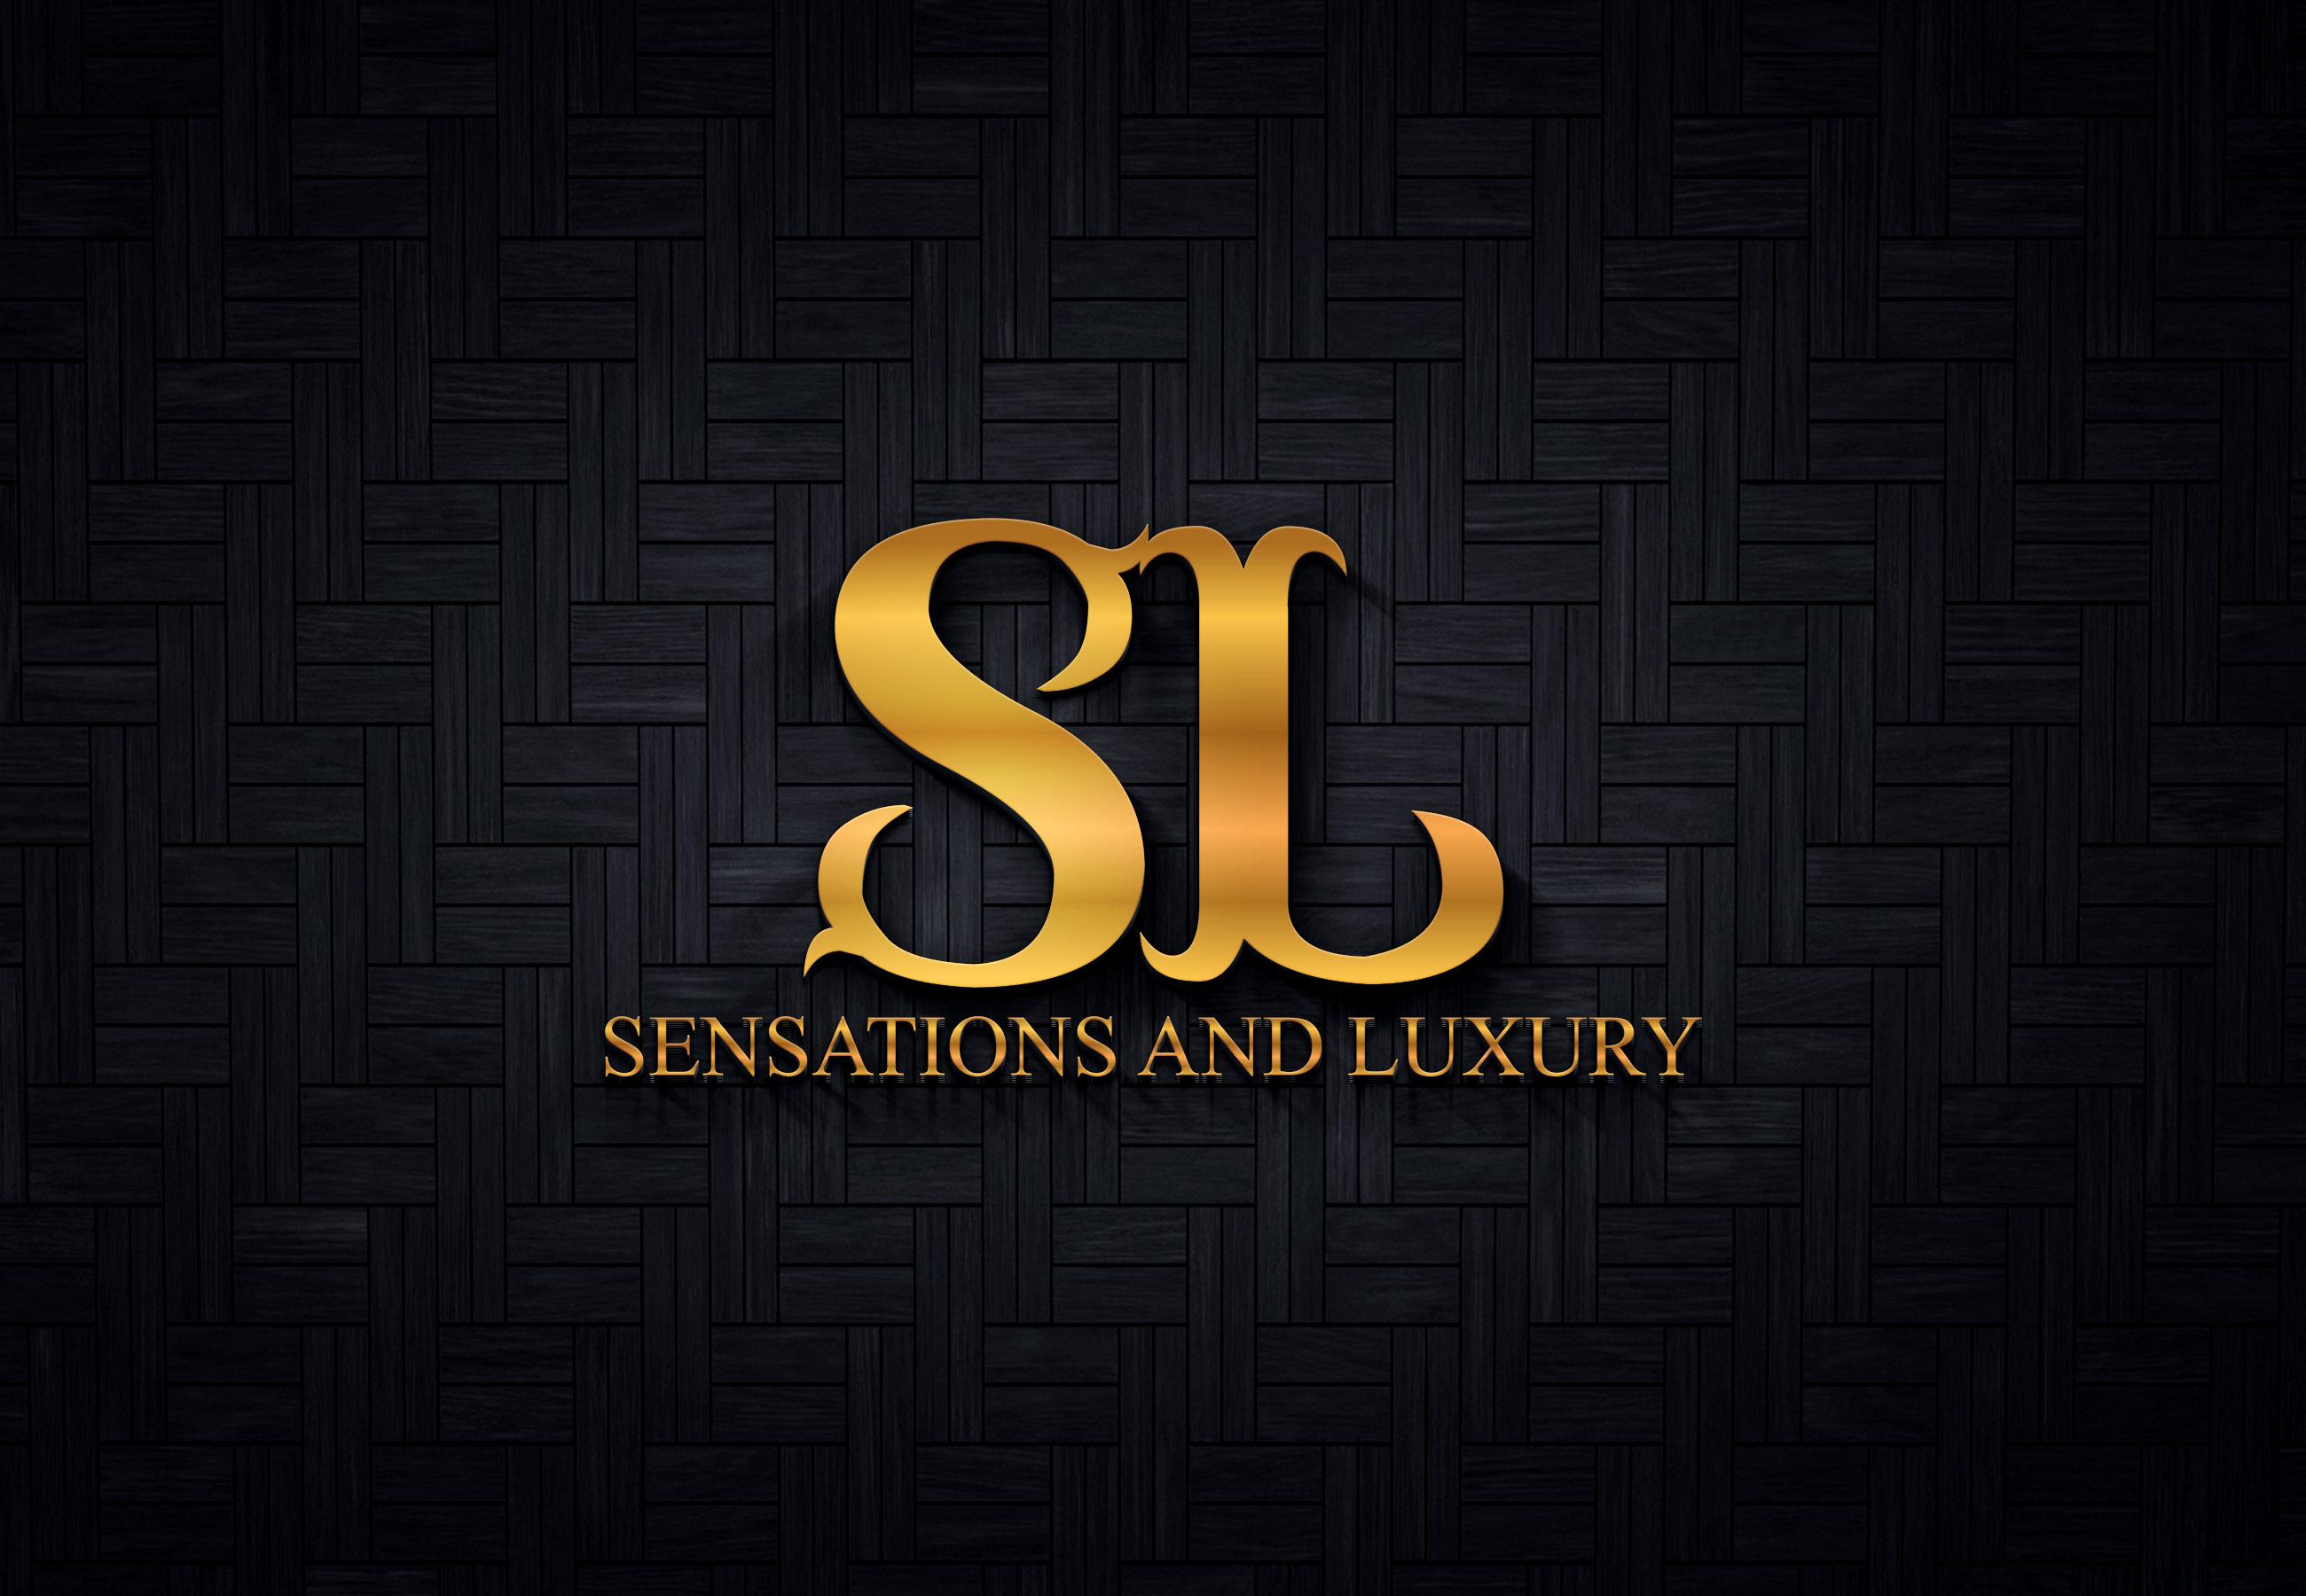 Sensations and Luxury